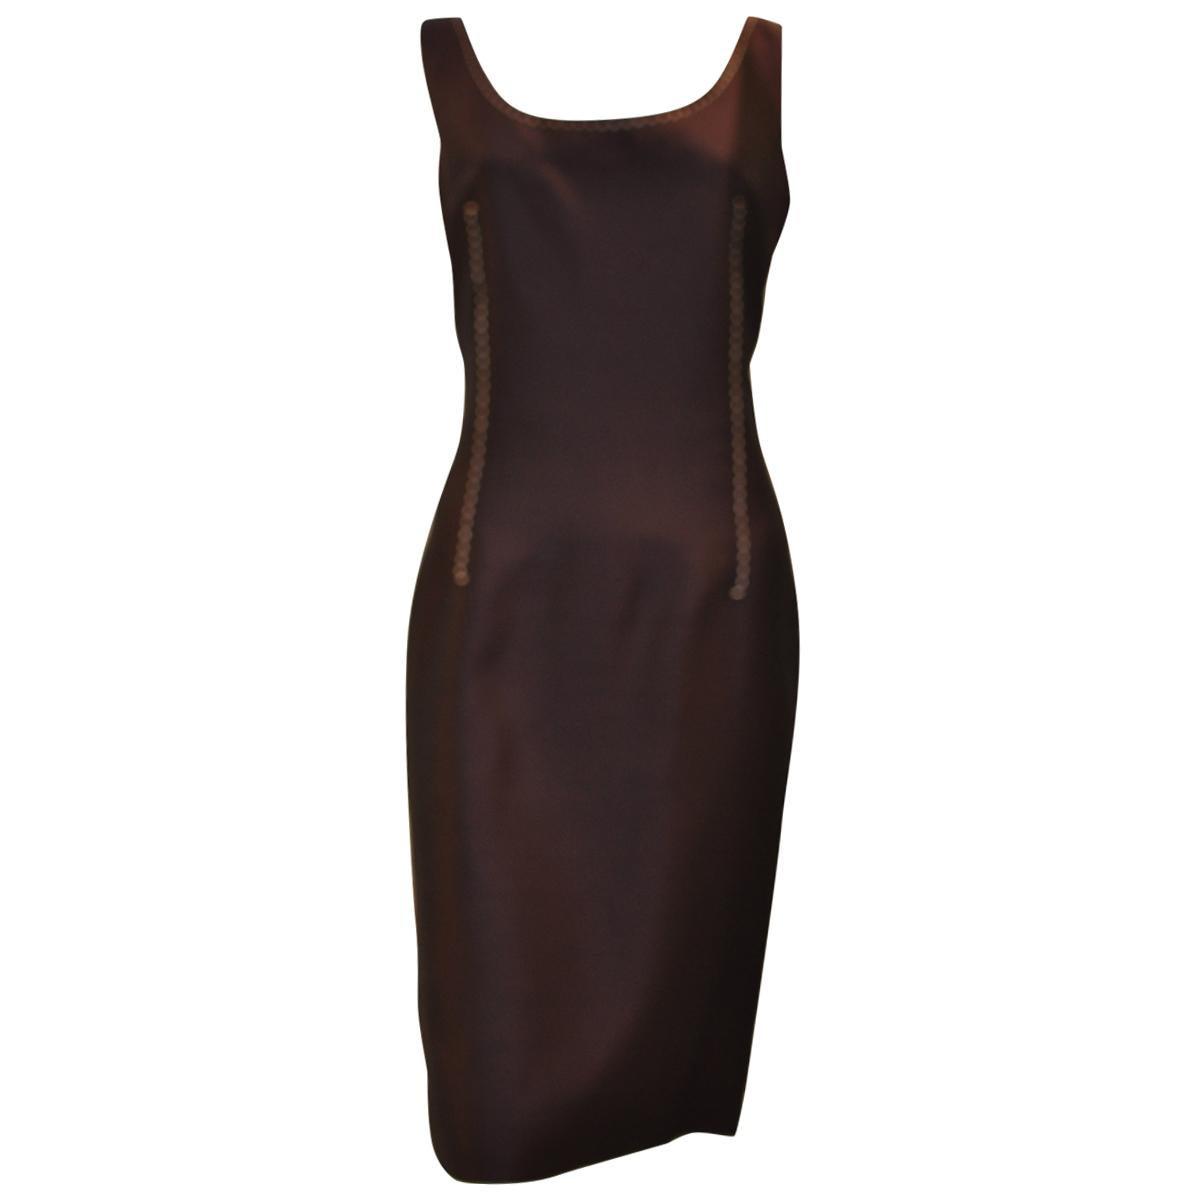 Christian Dior Silk Blend Maroon Dress, Spring 2000